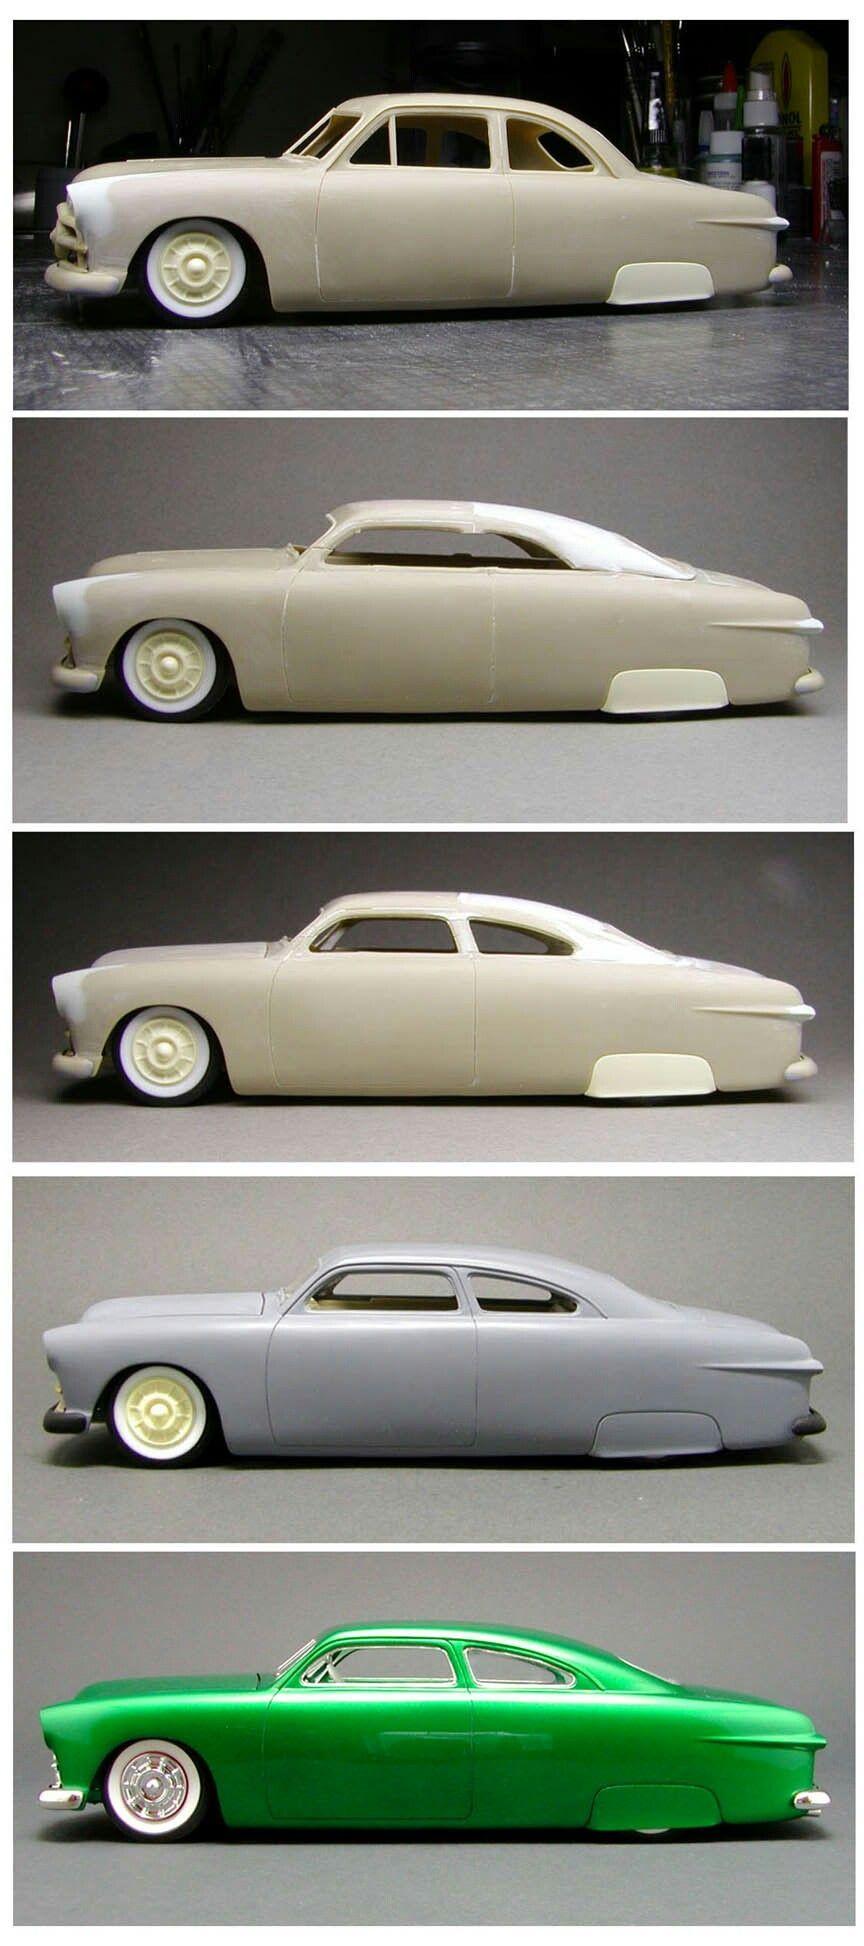 49 shoe box kustom model really nice racing rc car http